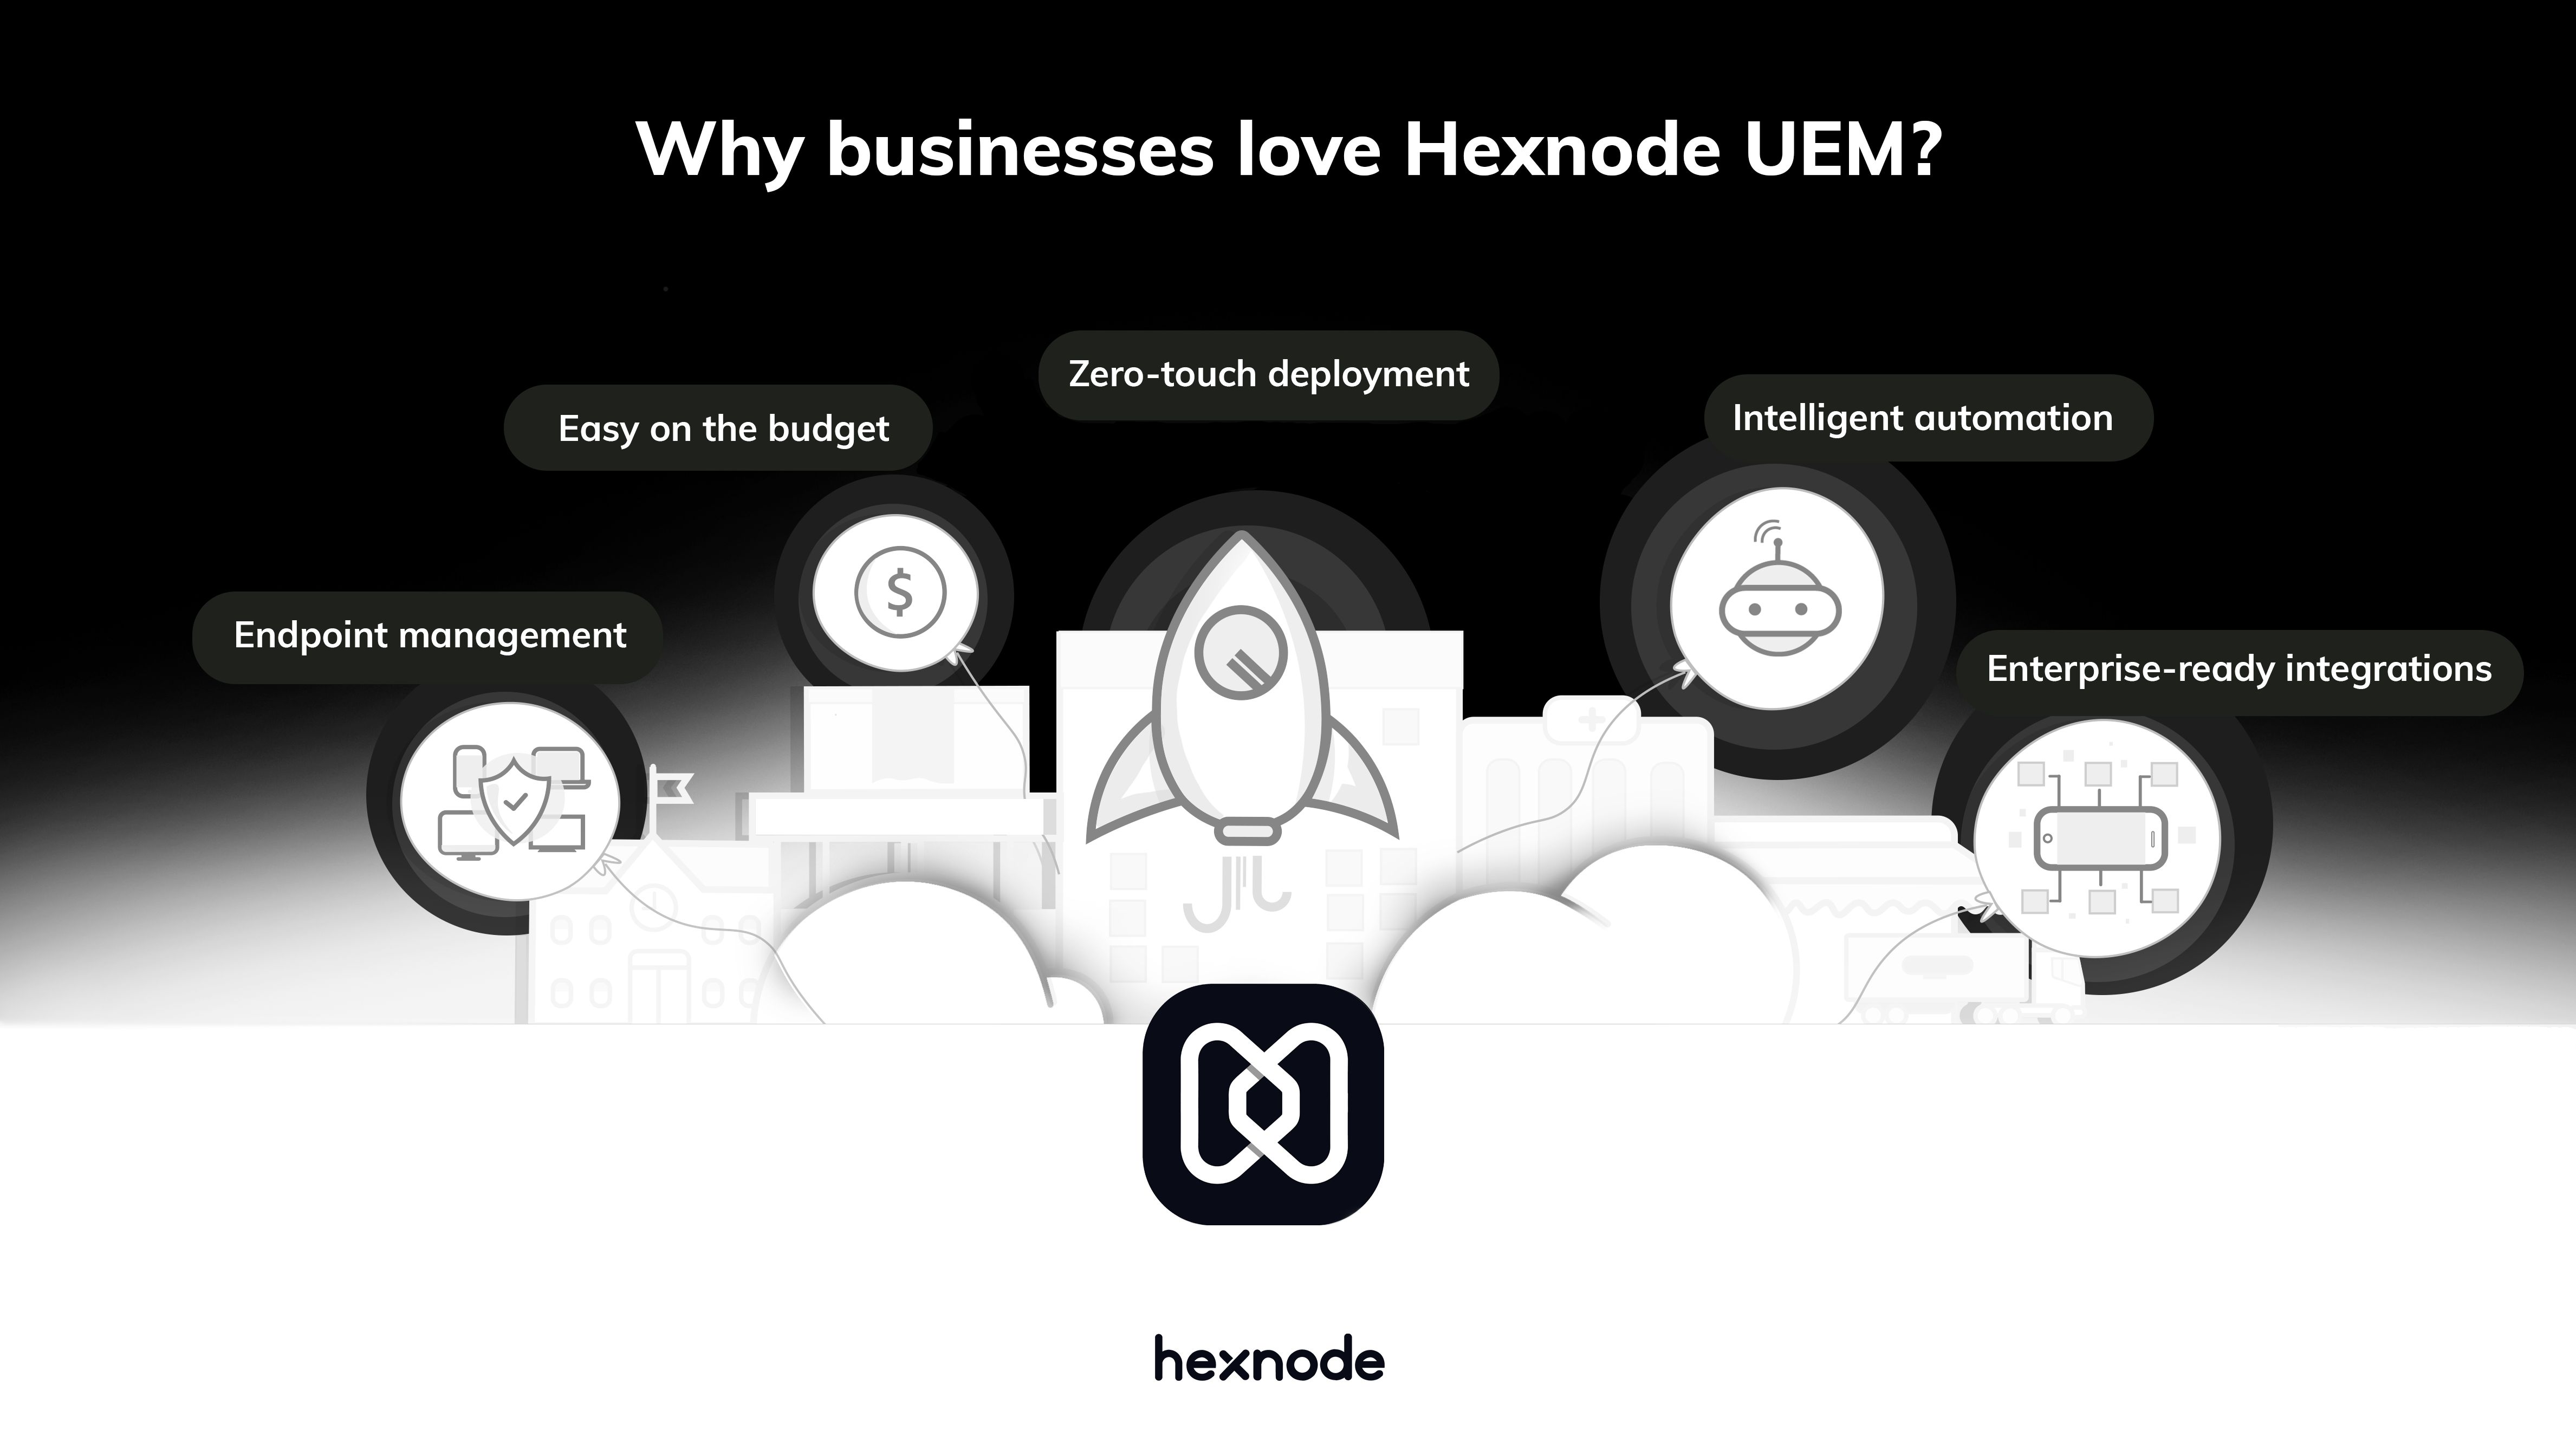 Why Hexnode UEM